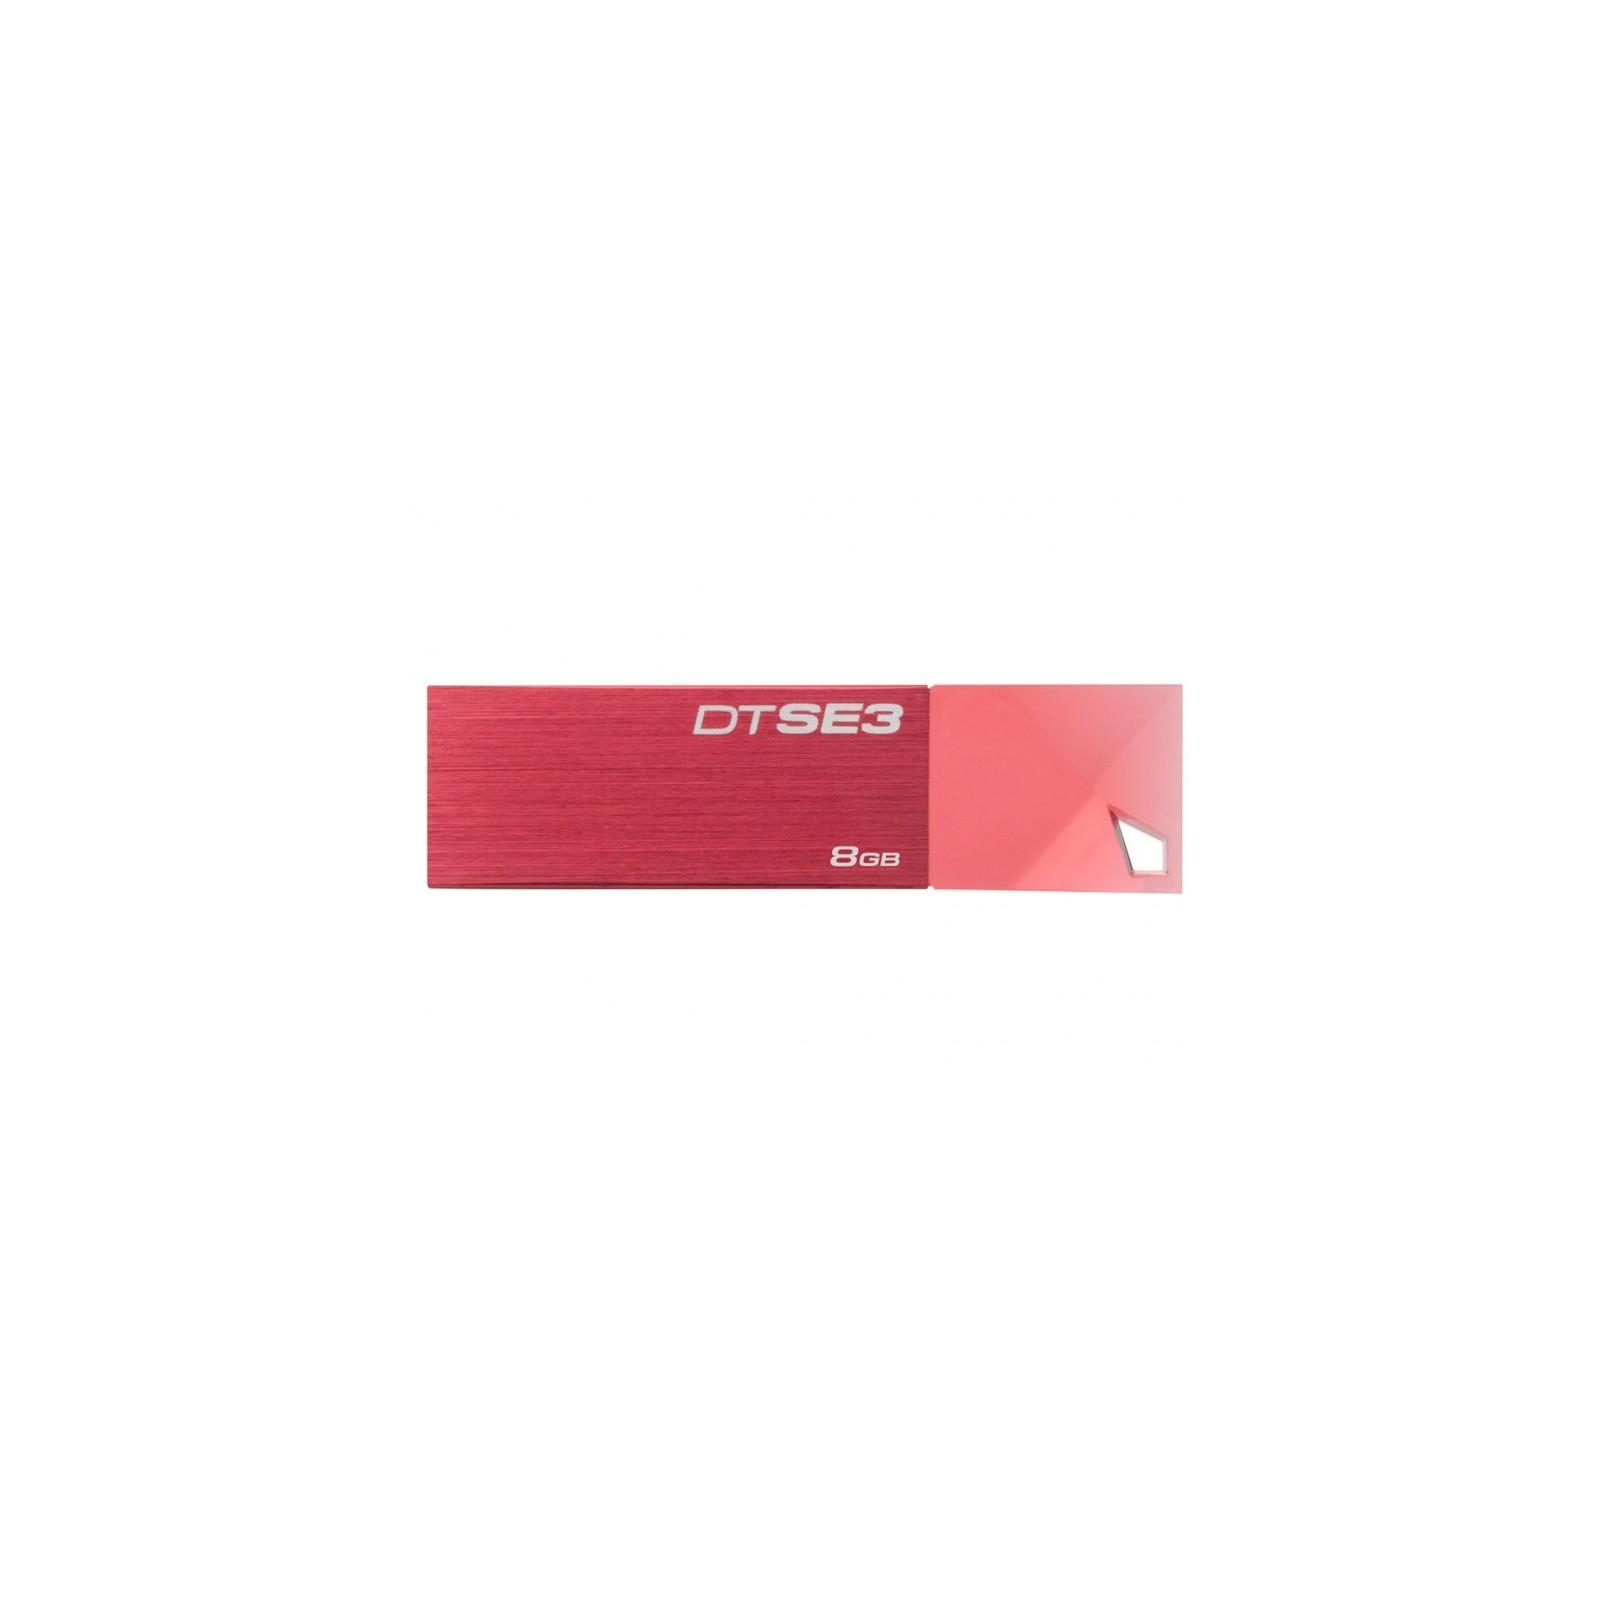 USB флеш накопитель Kingston 8GB DTSE3 Metalic Red USB 2.0 (KC-U688G-4C1R)